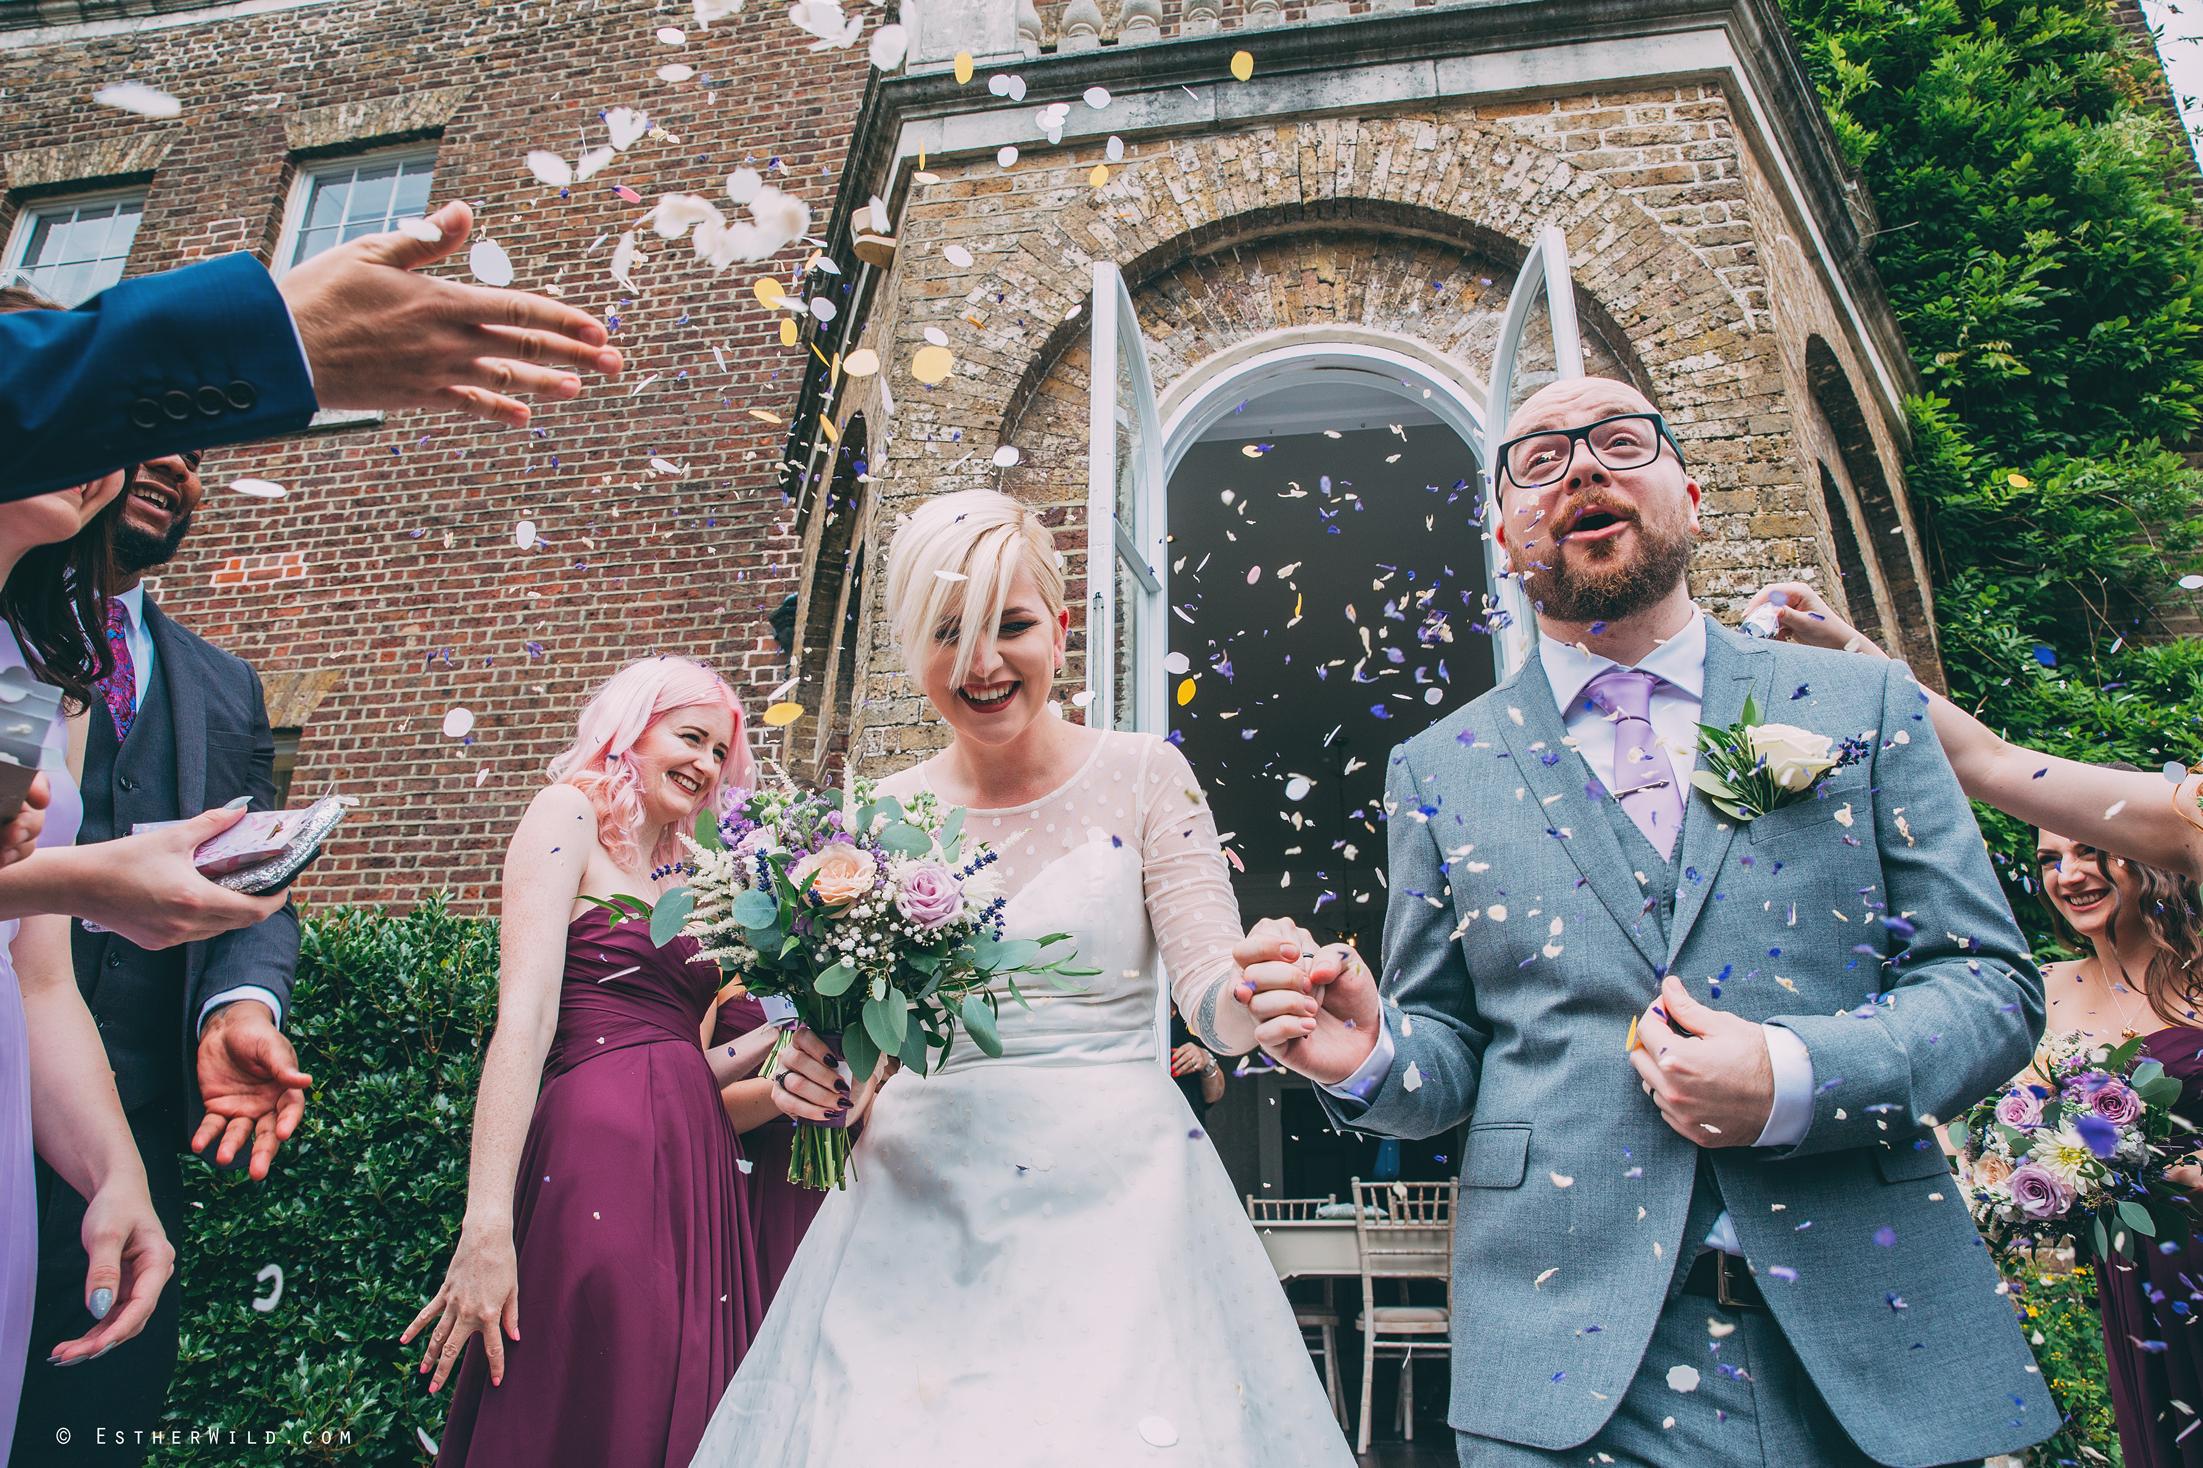 0617_London_Croydon_Clapham_Wedding_Photographer_Esther_Wild_Photography_IMG_5393.jpg